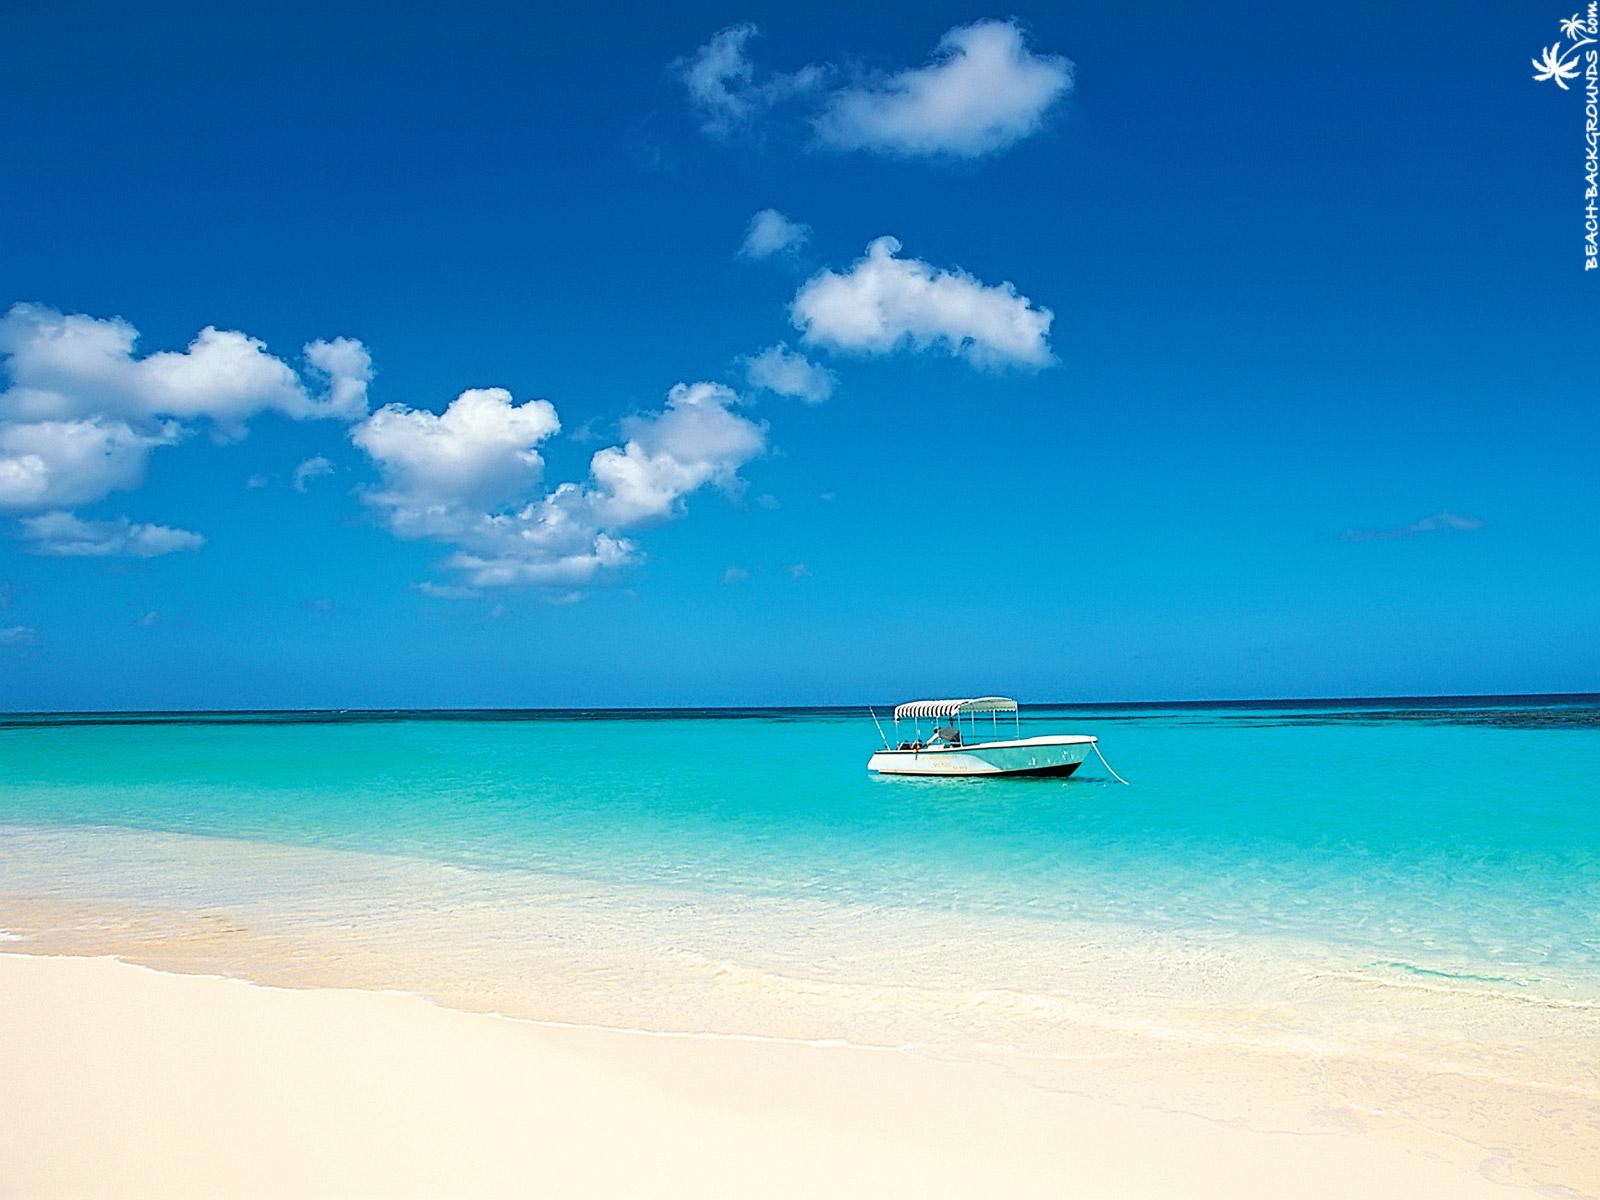 tropical beach screensavers wallpaper desktop hd (1600 x 1200 ) - hd